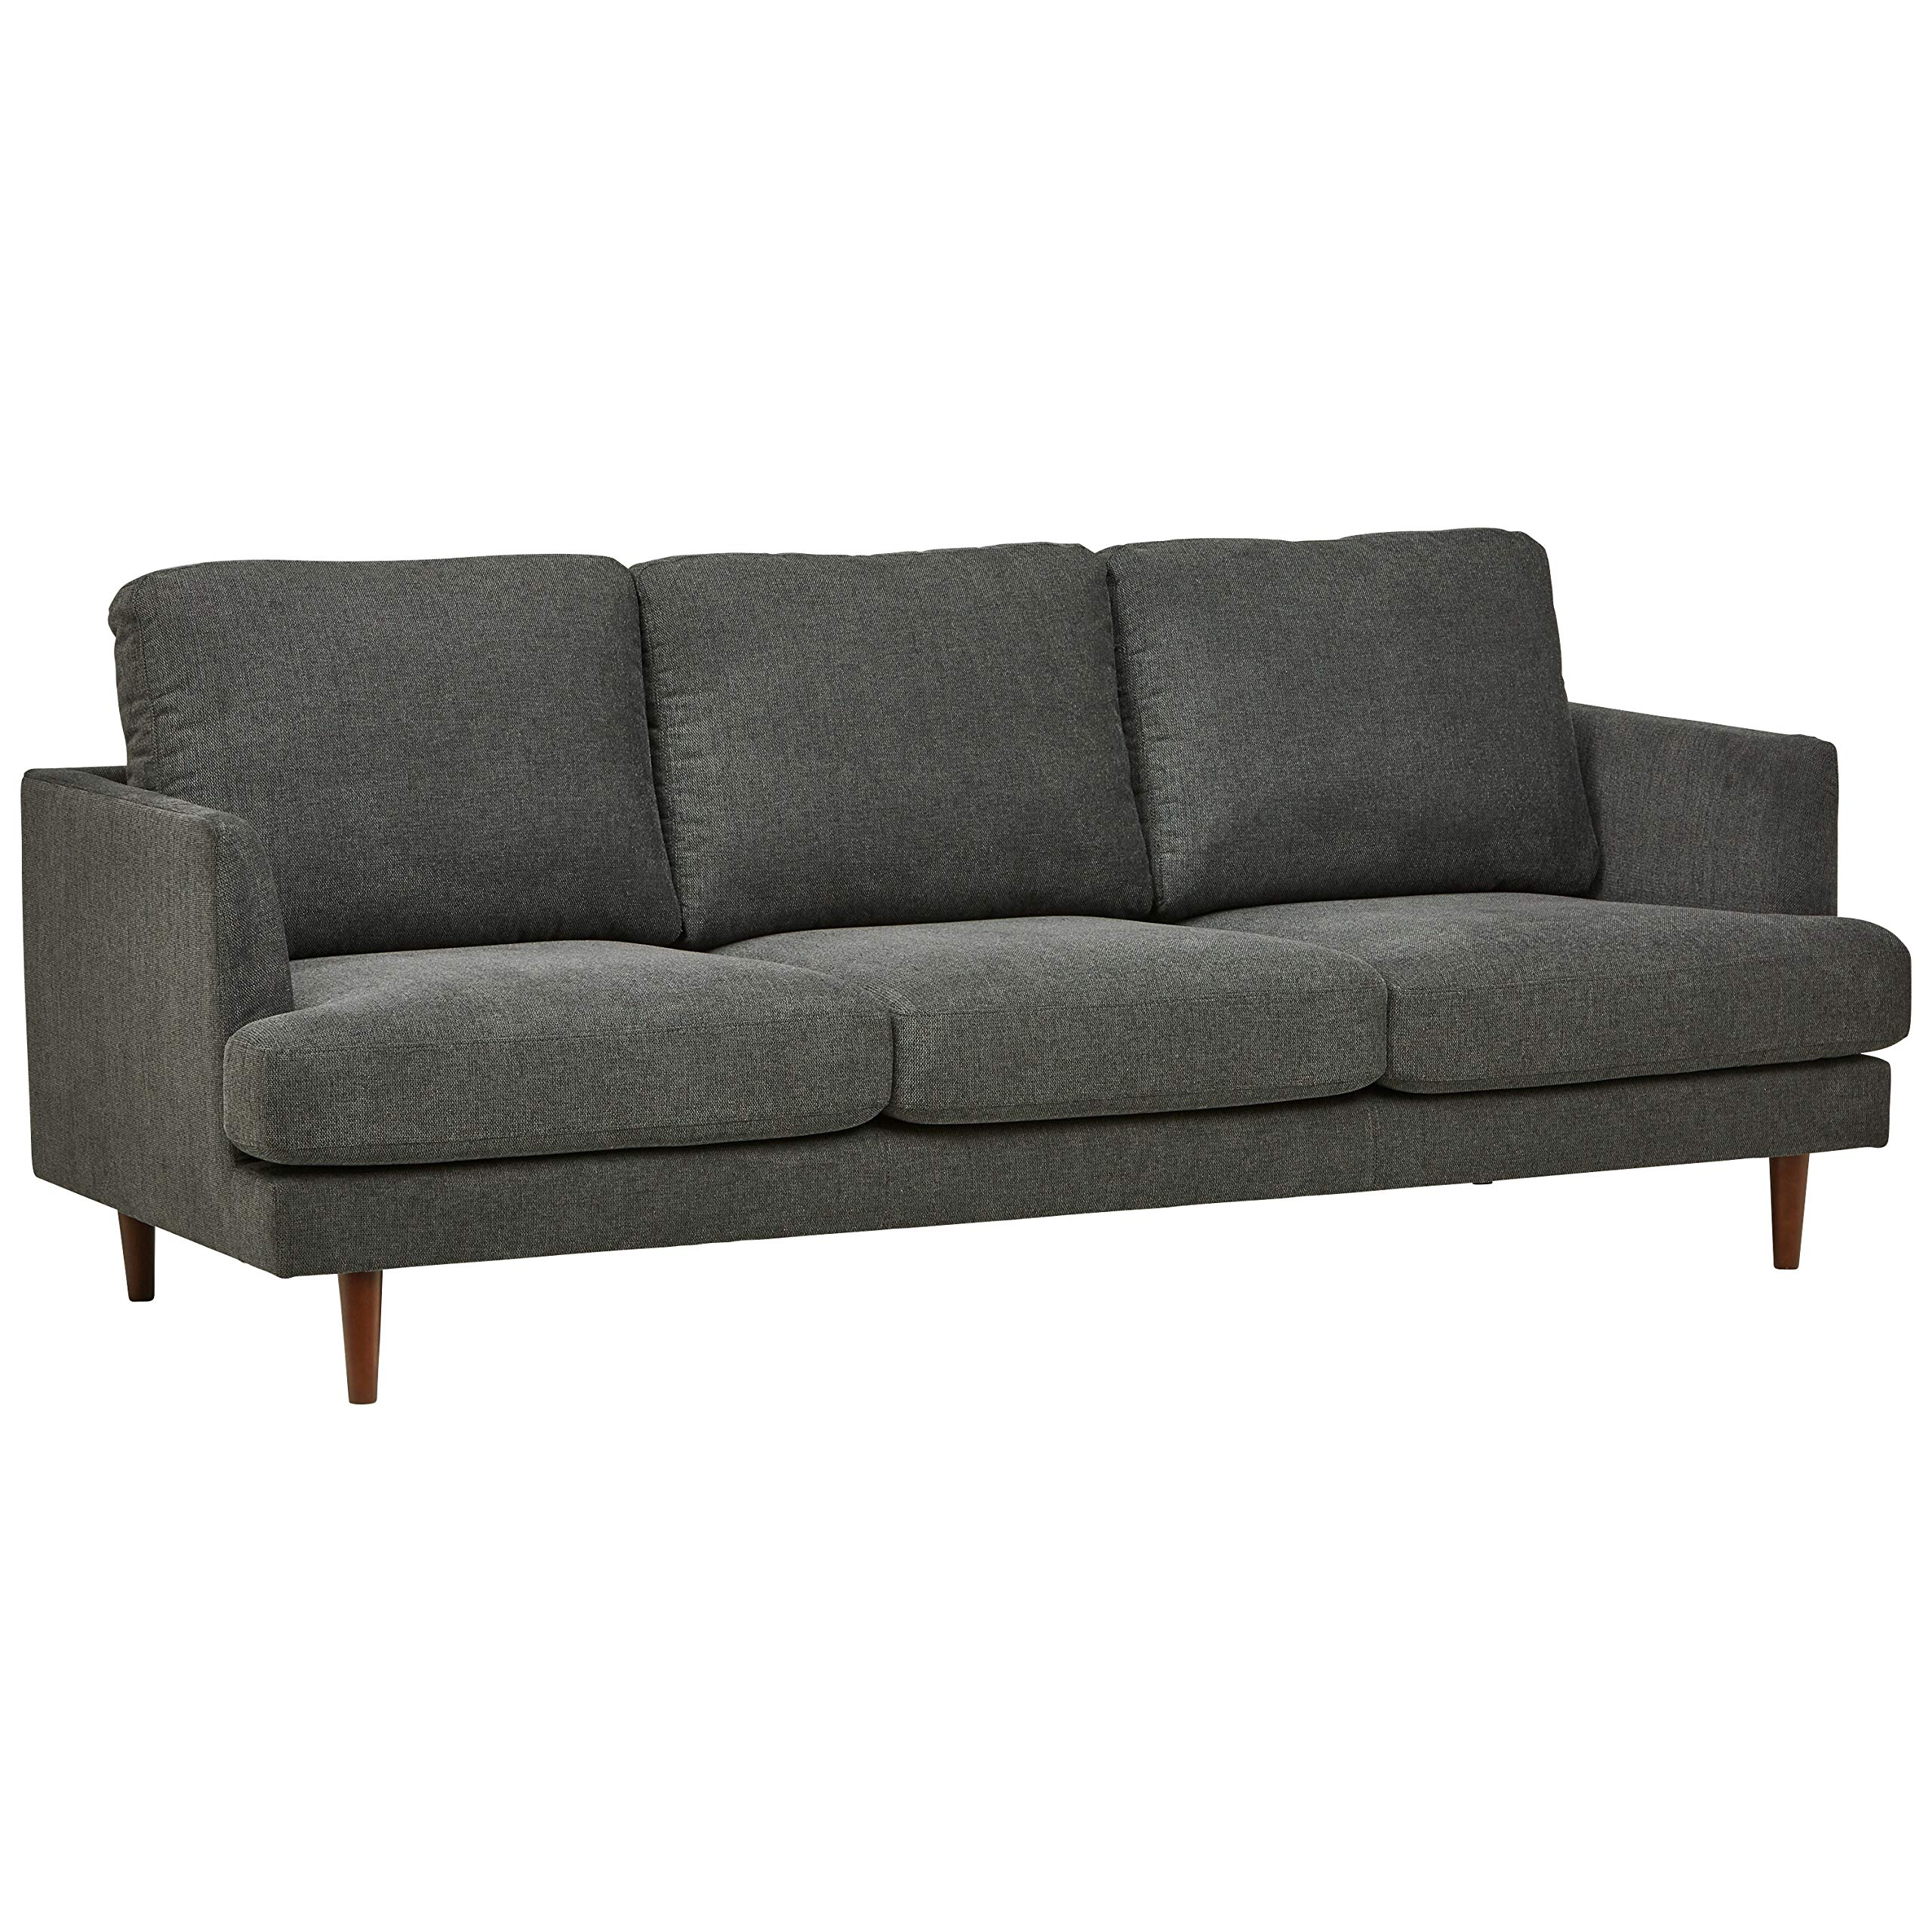 Rivet Goodwin Modern Sofa, 88.6''W, Charcoal Grey by Rivet